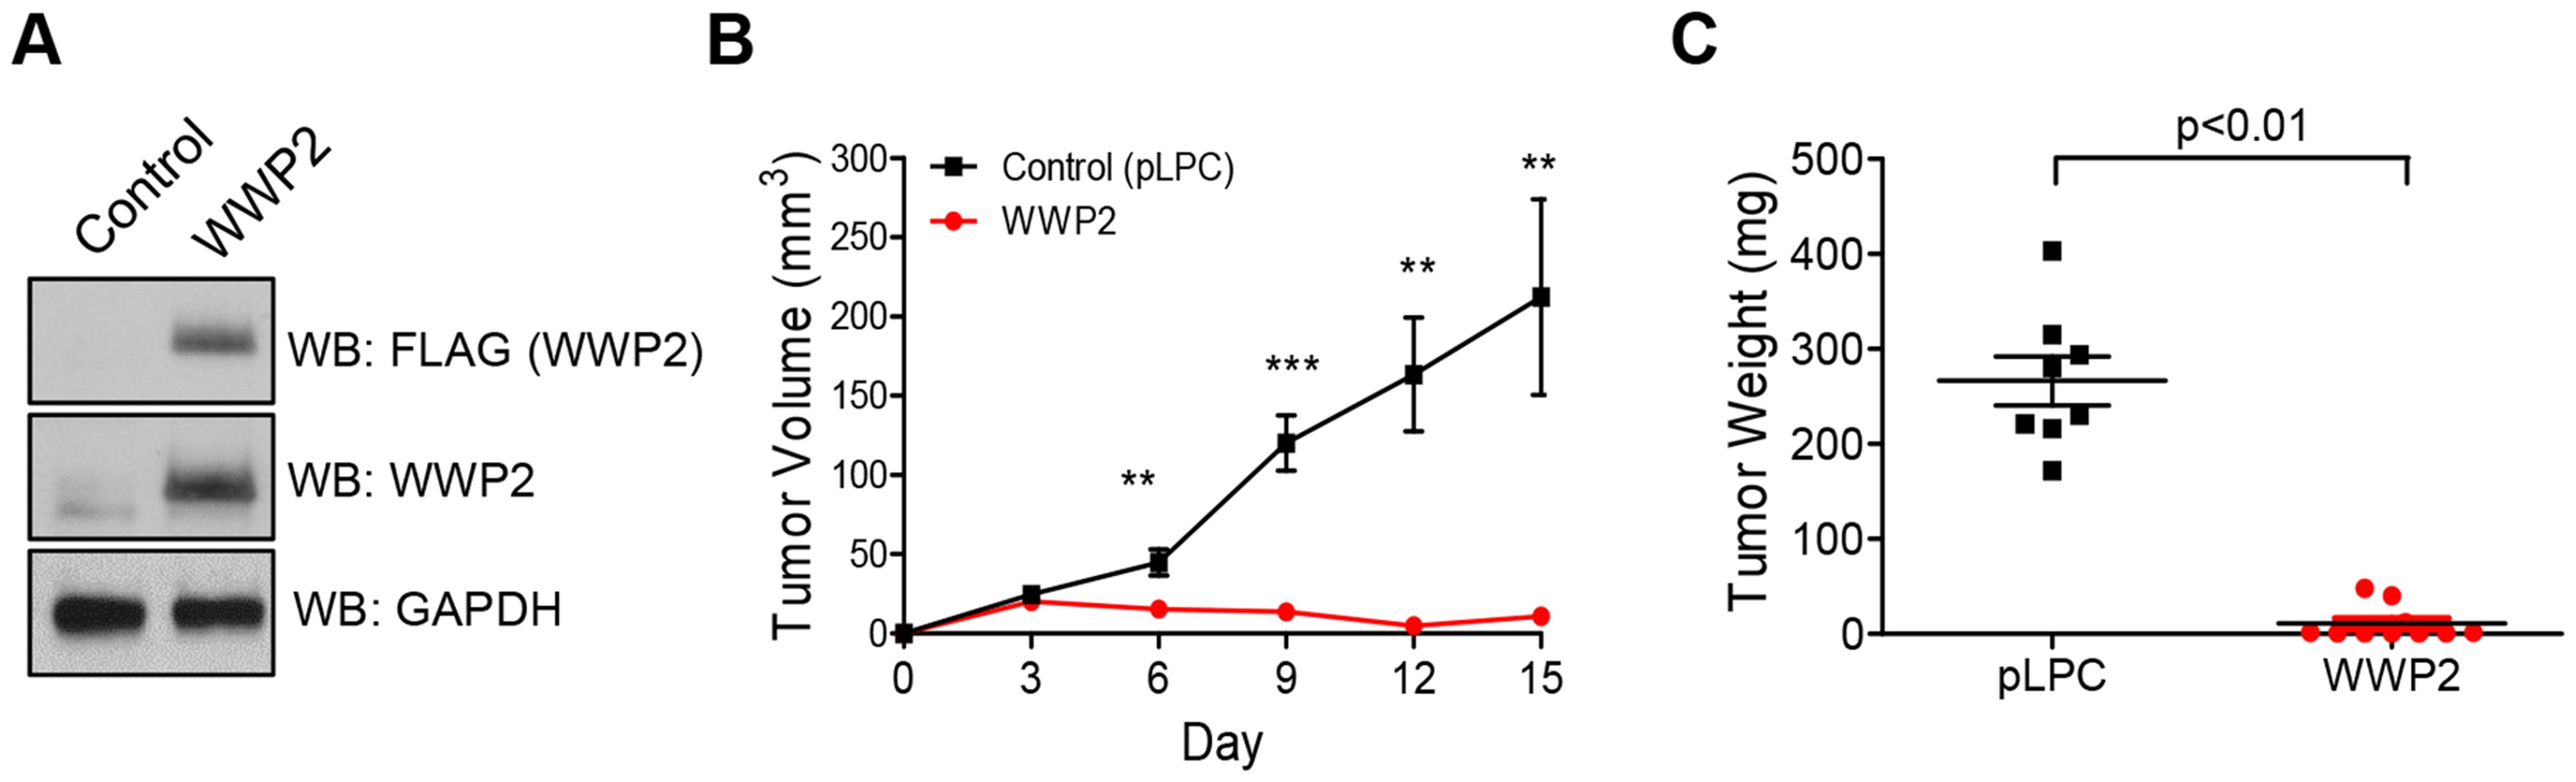 WWP2 suppresses tumor development of ovarian cancer cells.